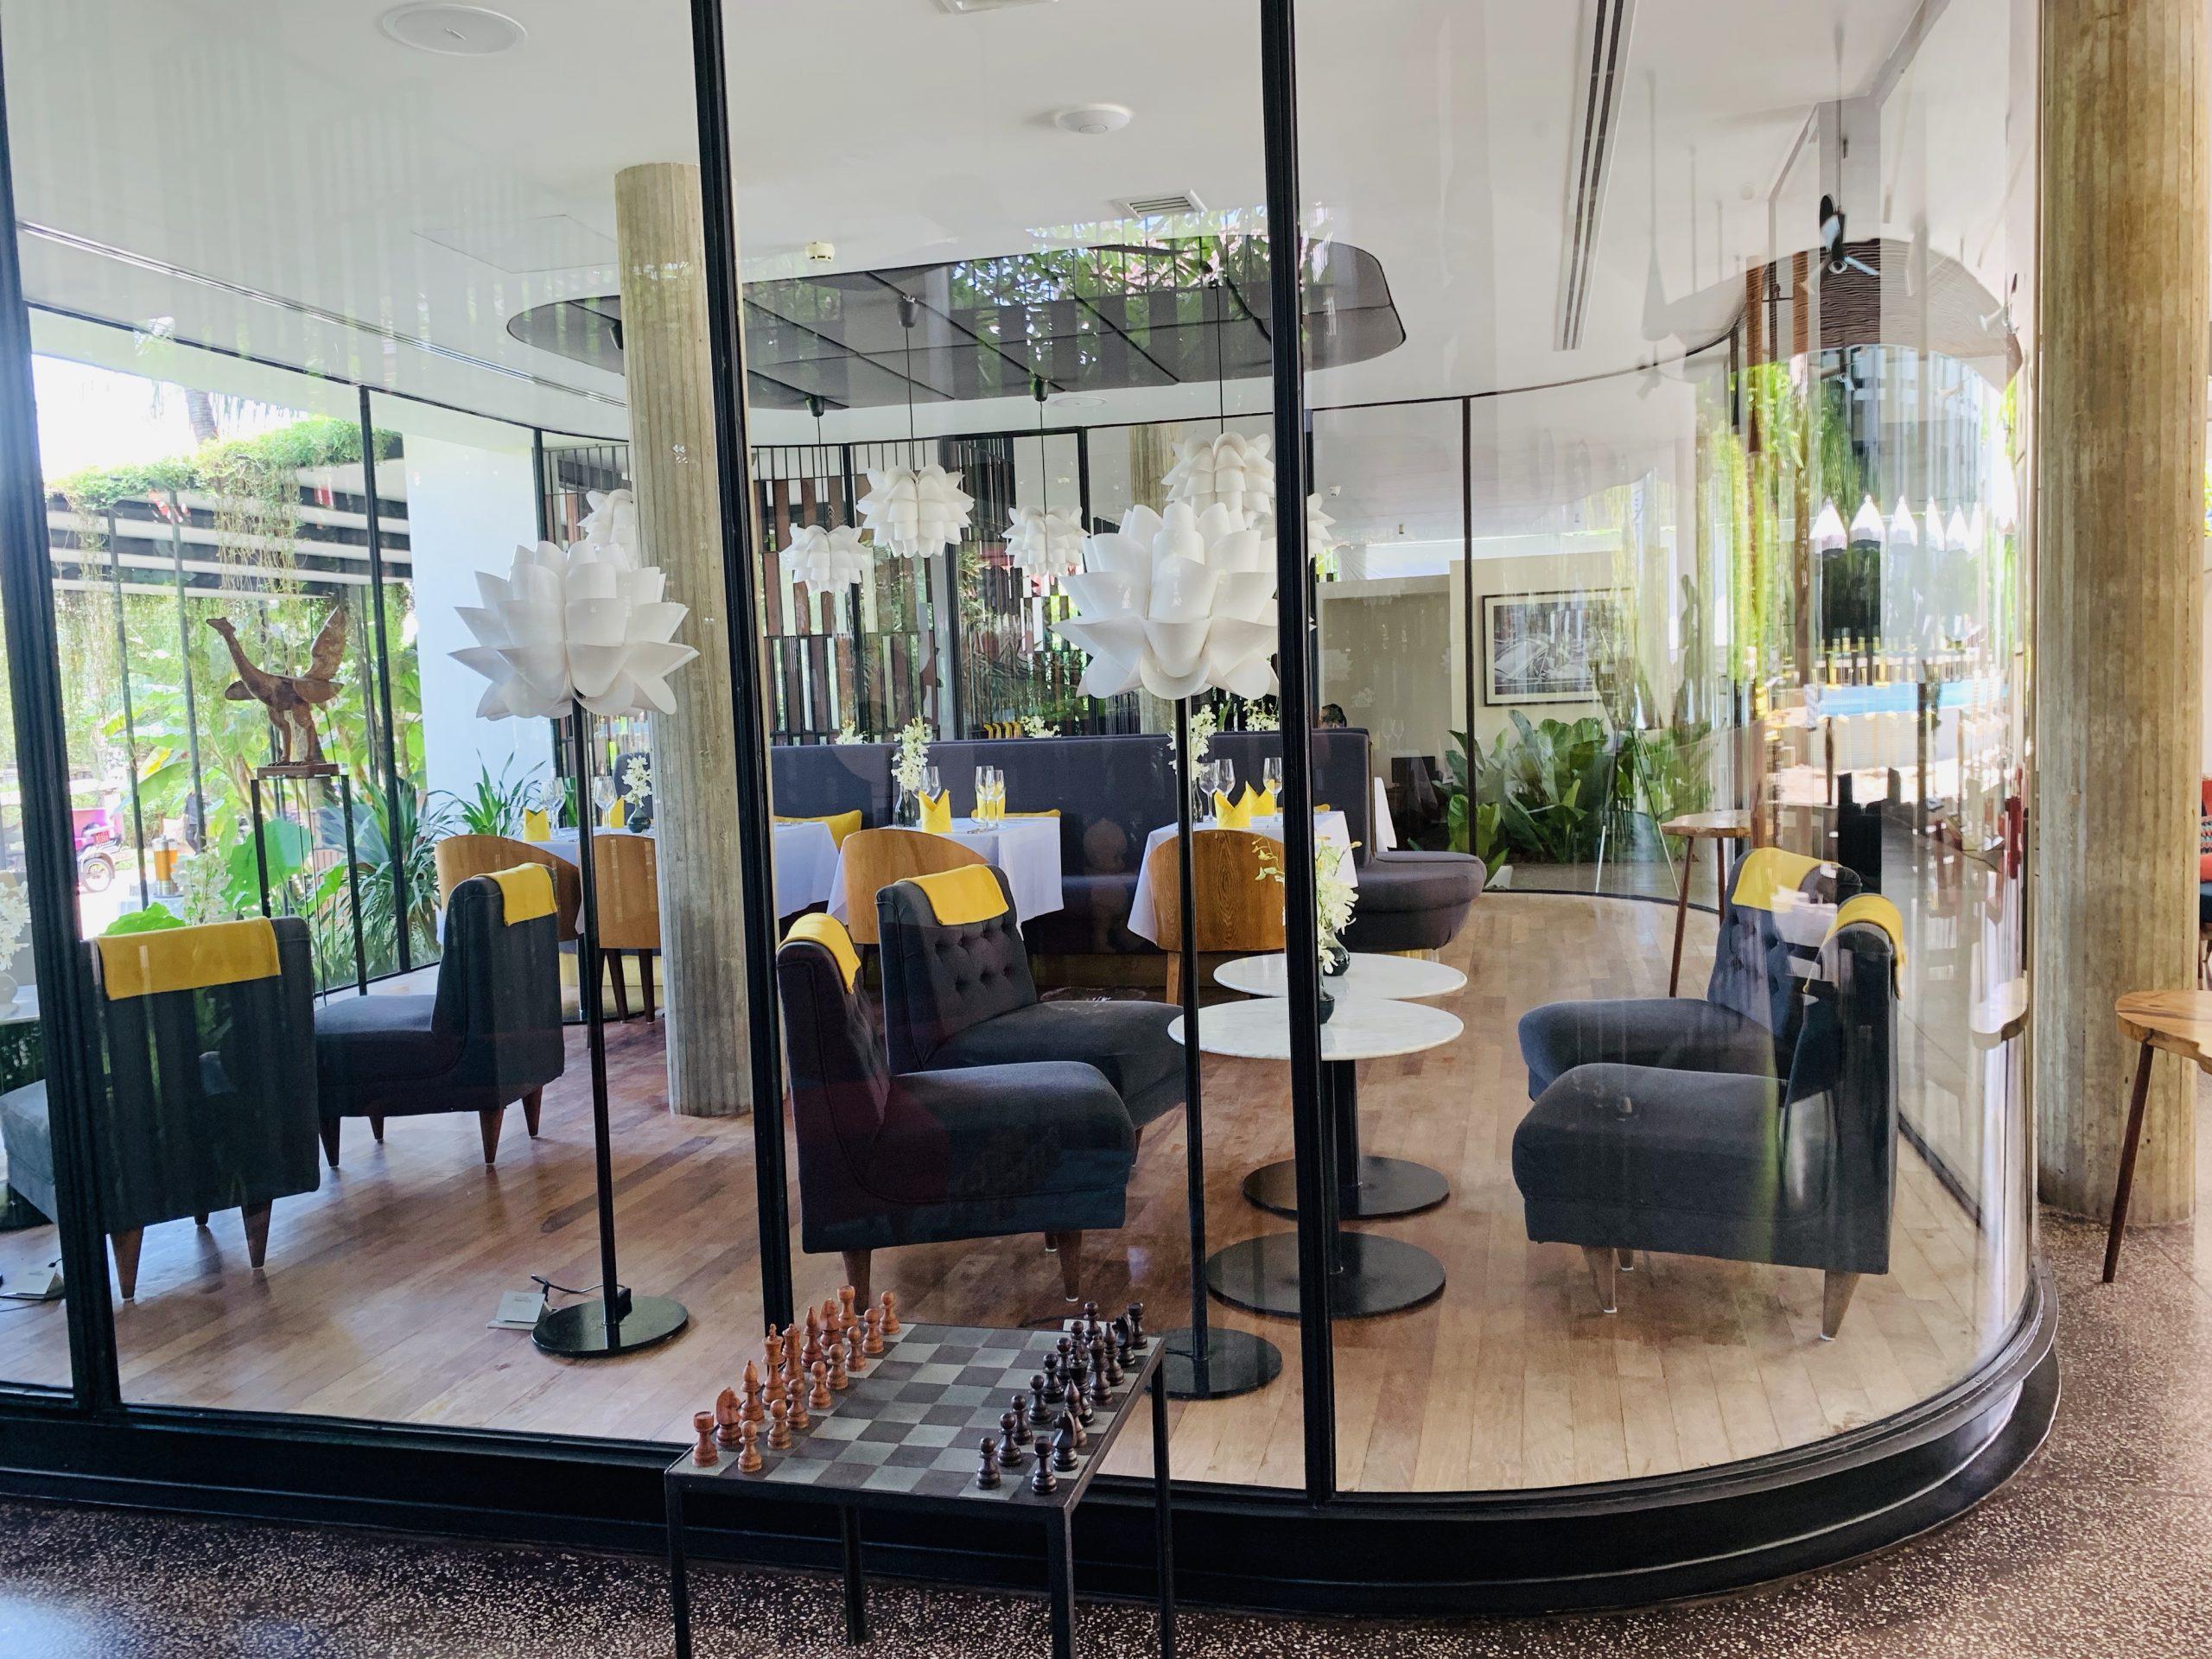 Restaurant at Viroth_s